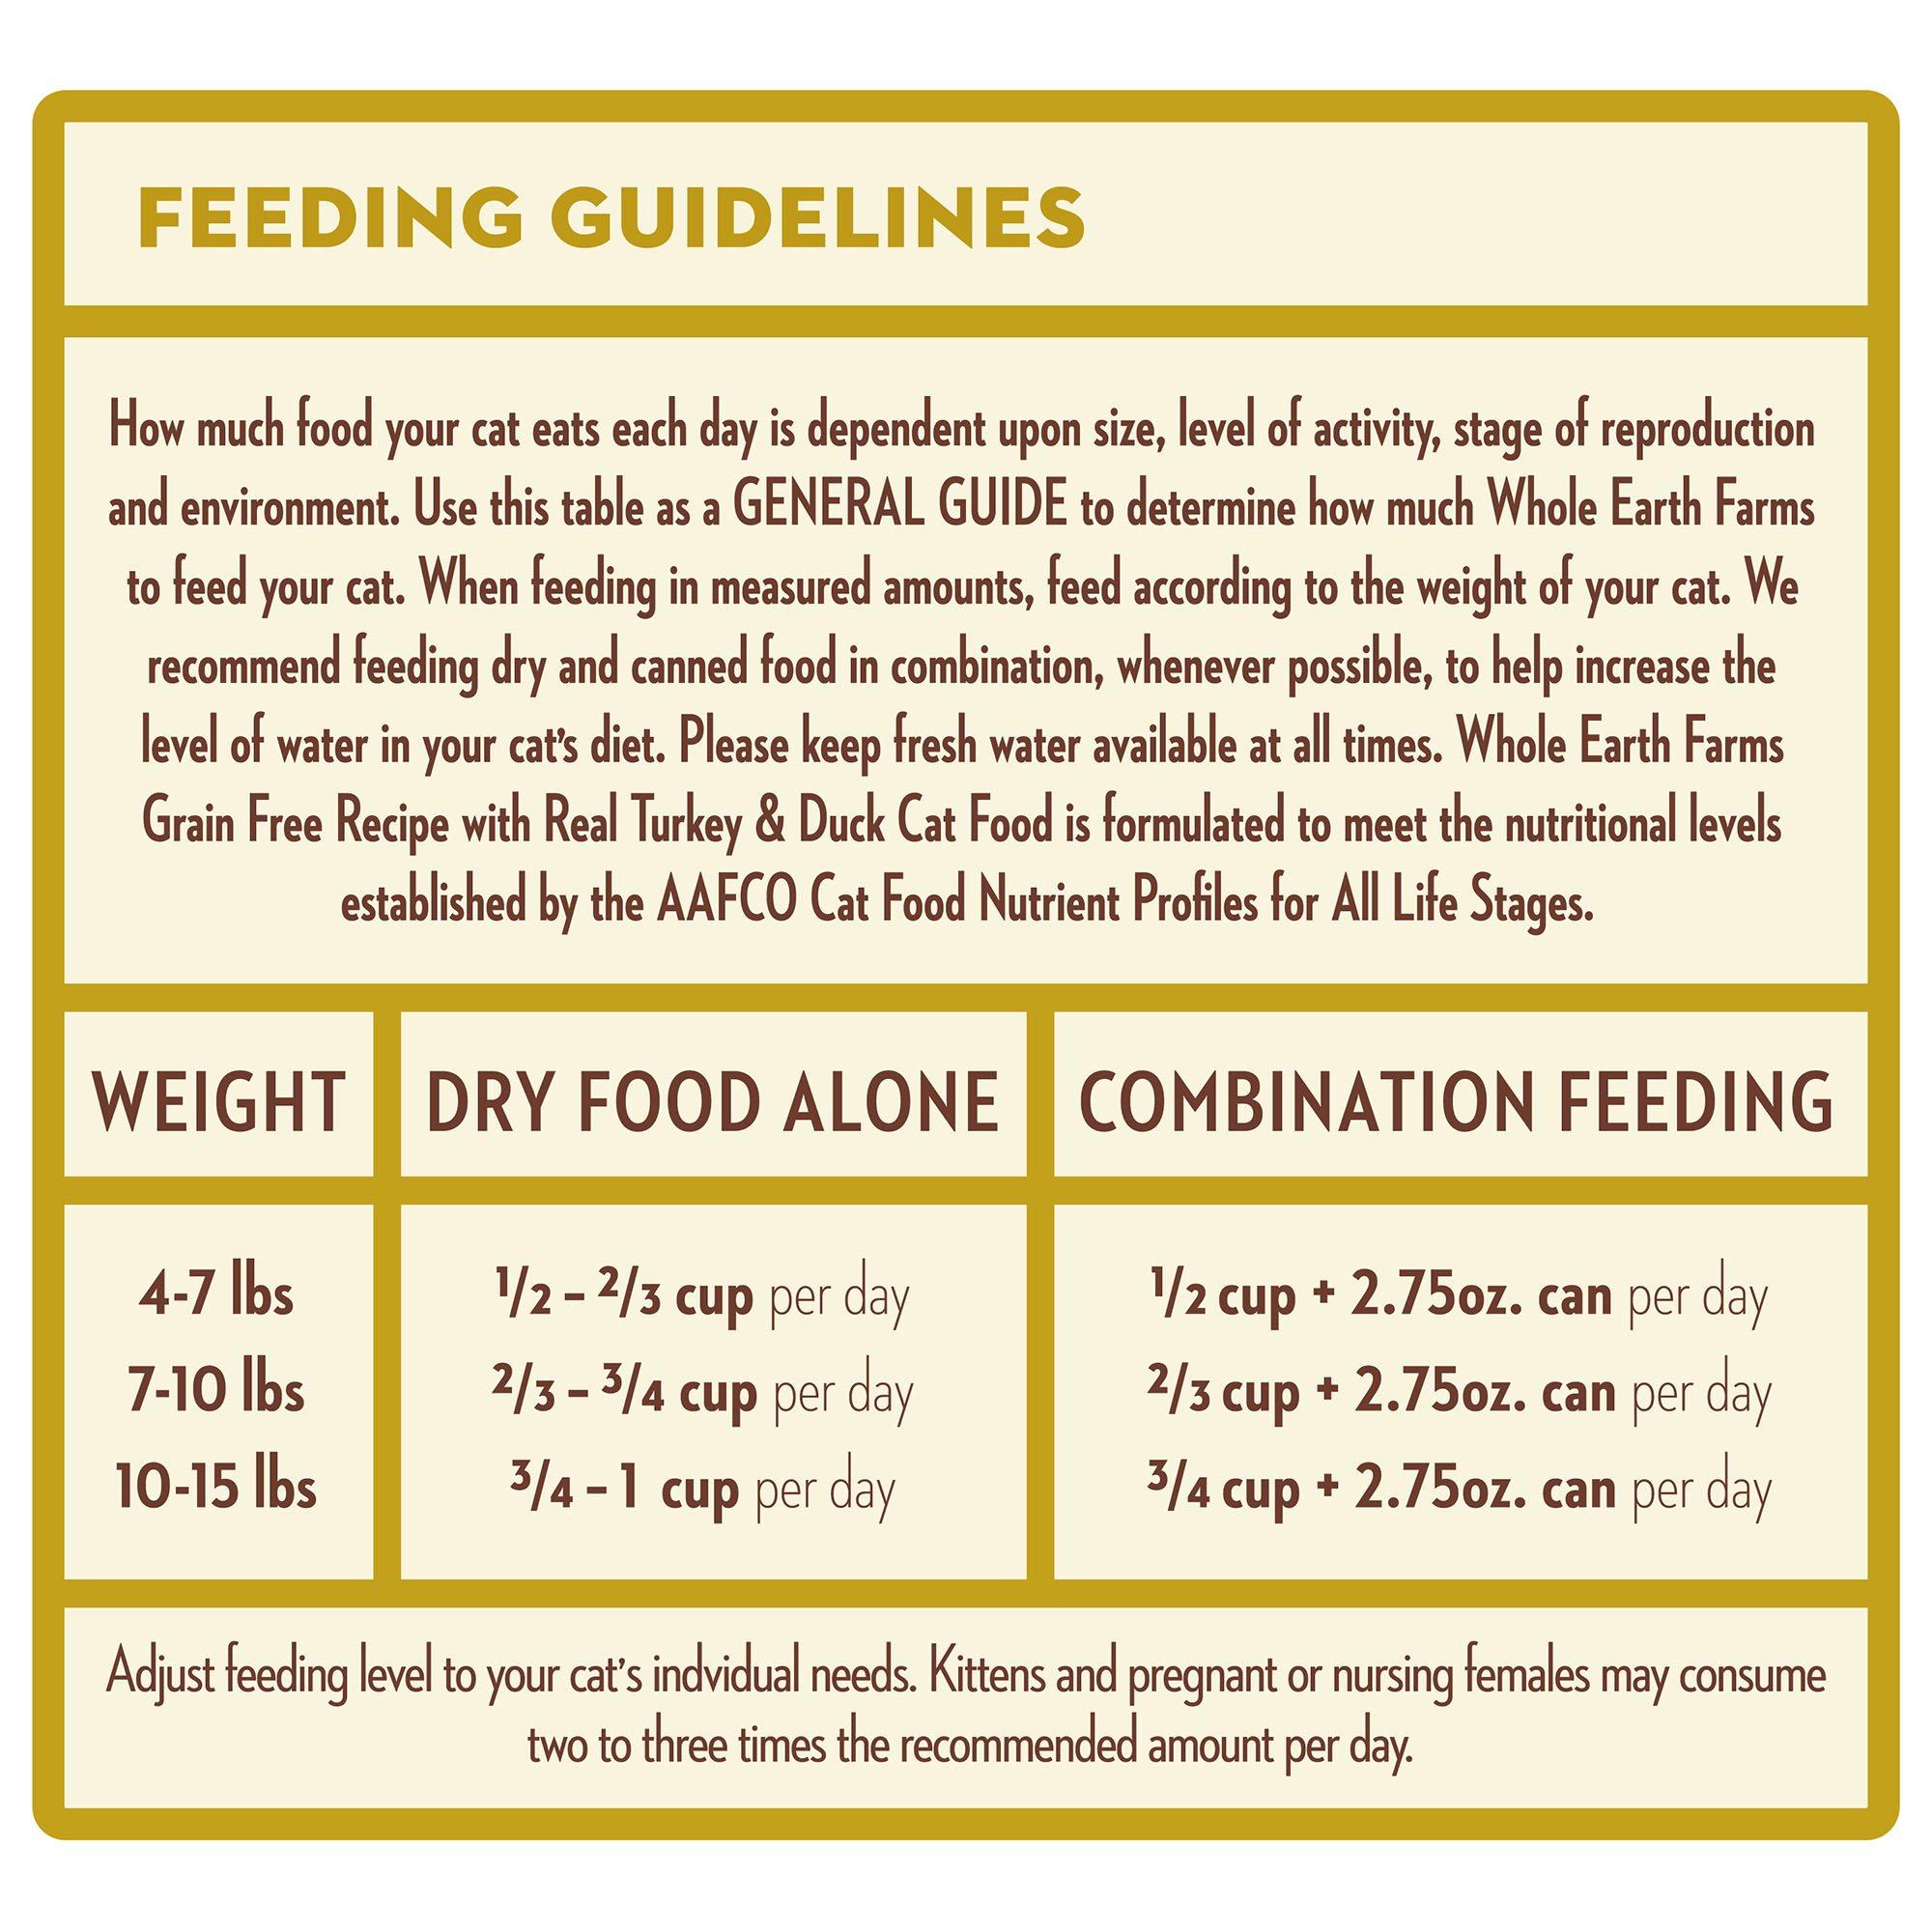 Whole-Earth-Farms-Grain-Free-Real-Turkey-amp-Duck-Cat-Food thumbnail 13